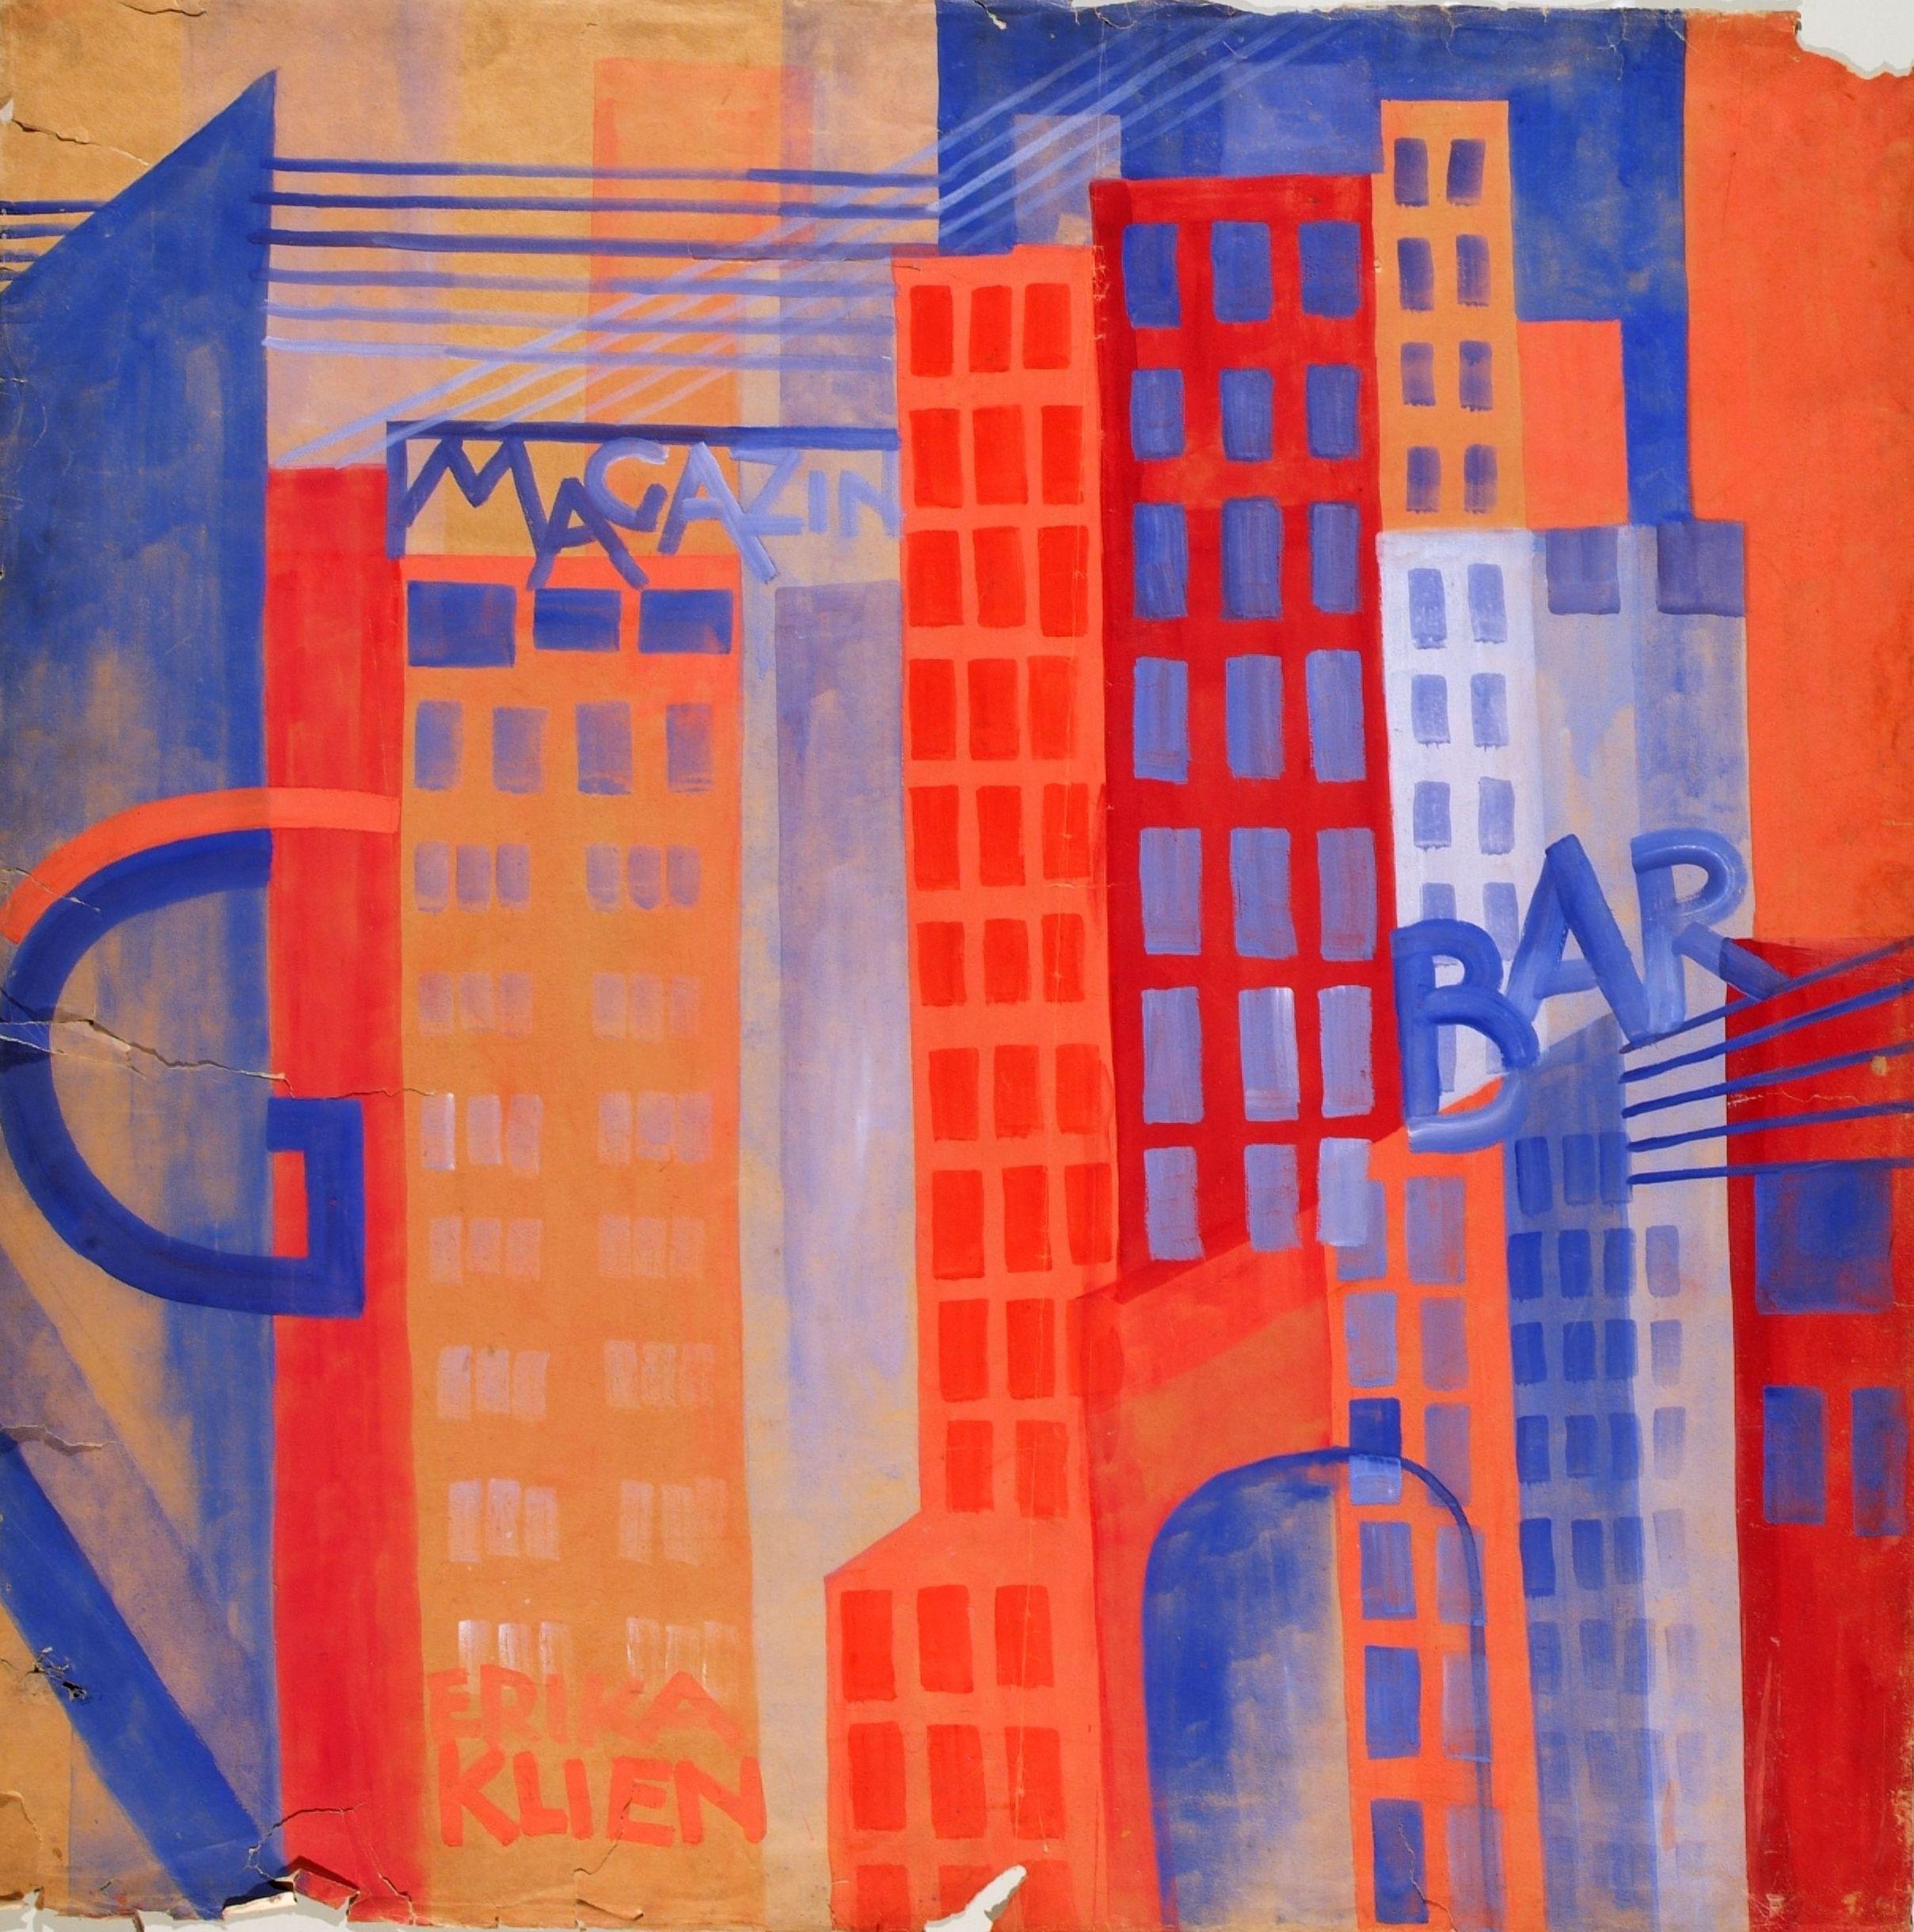 Artwork of the Month, June 2020: A Walk Through the Metropolis by Erika Giovanna Klien (1923)